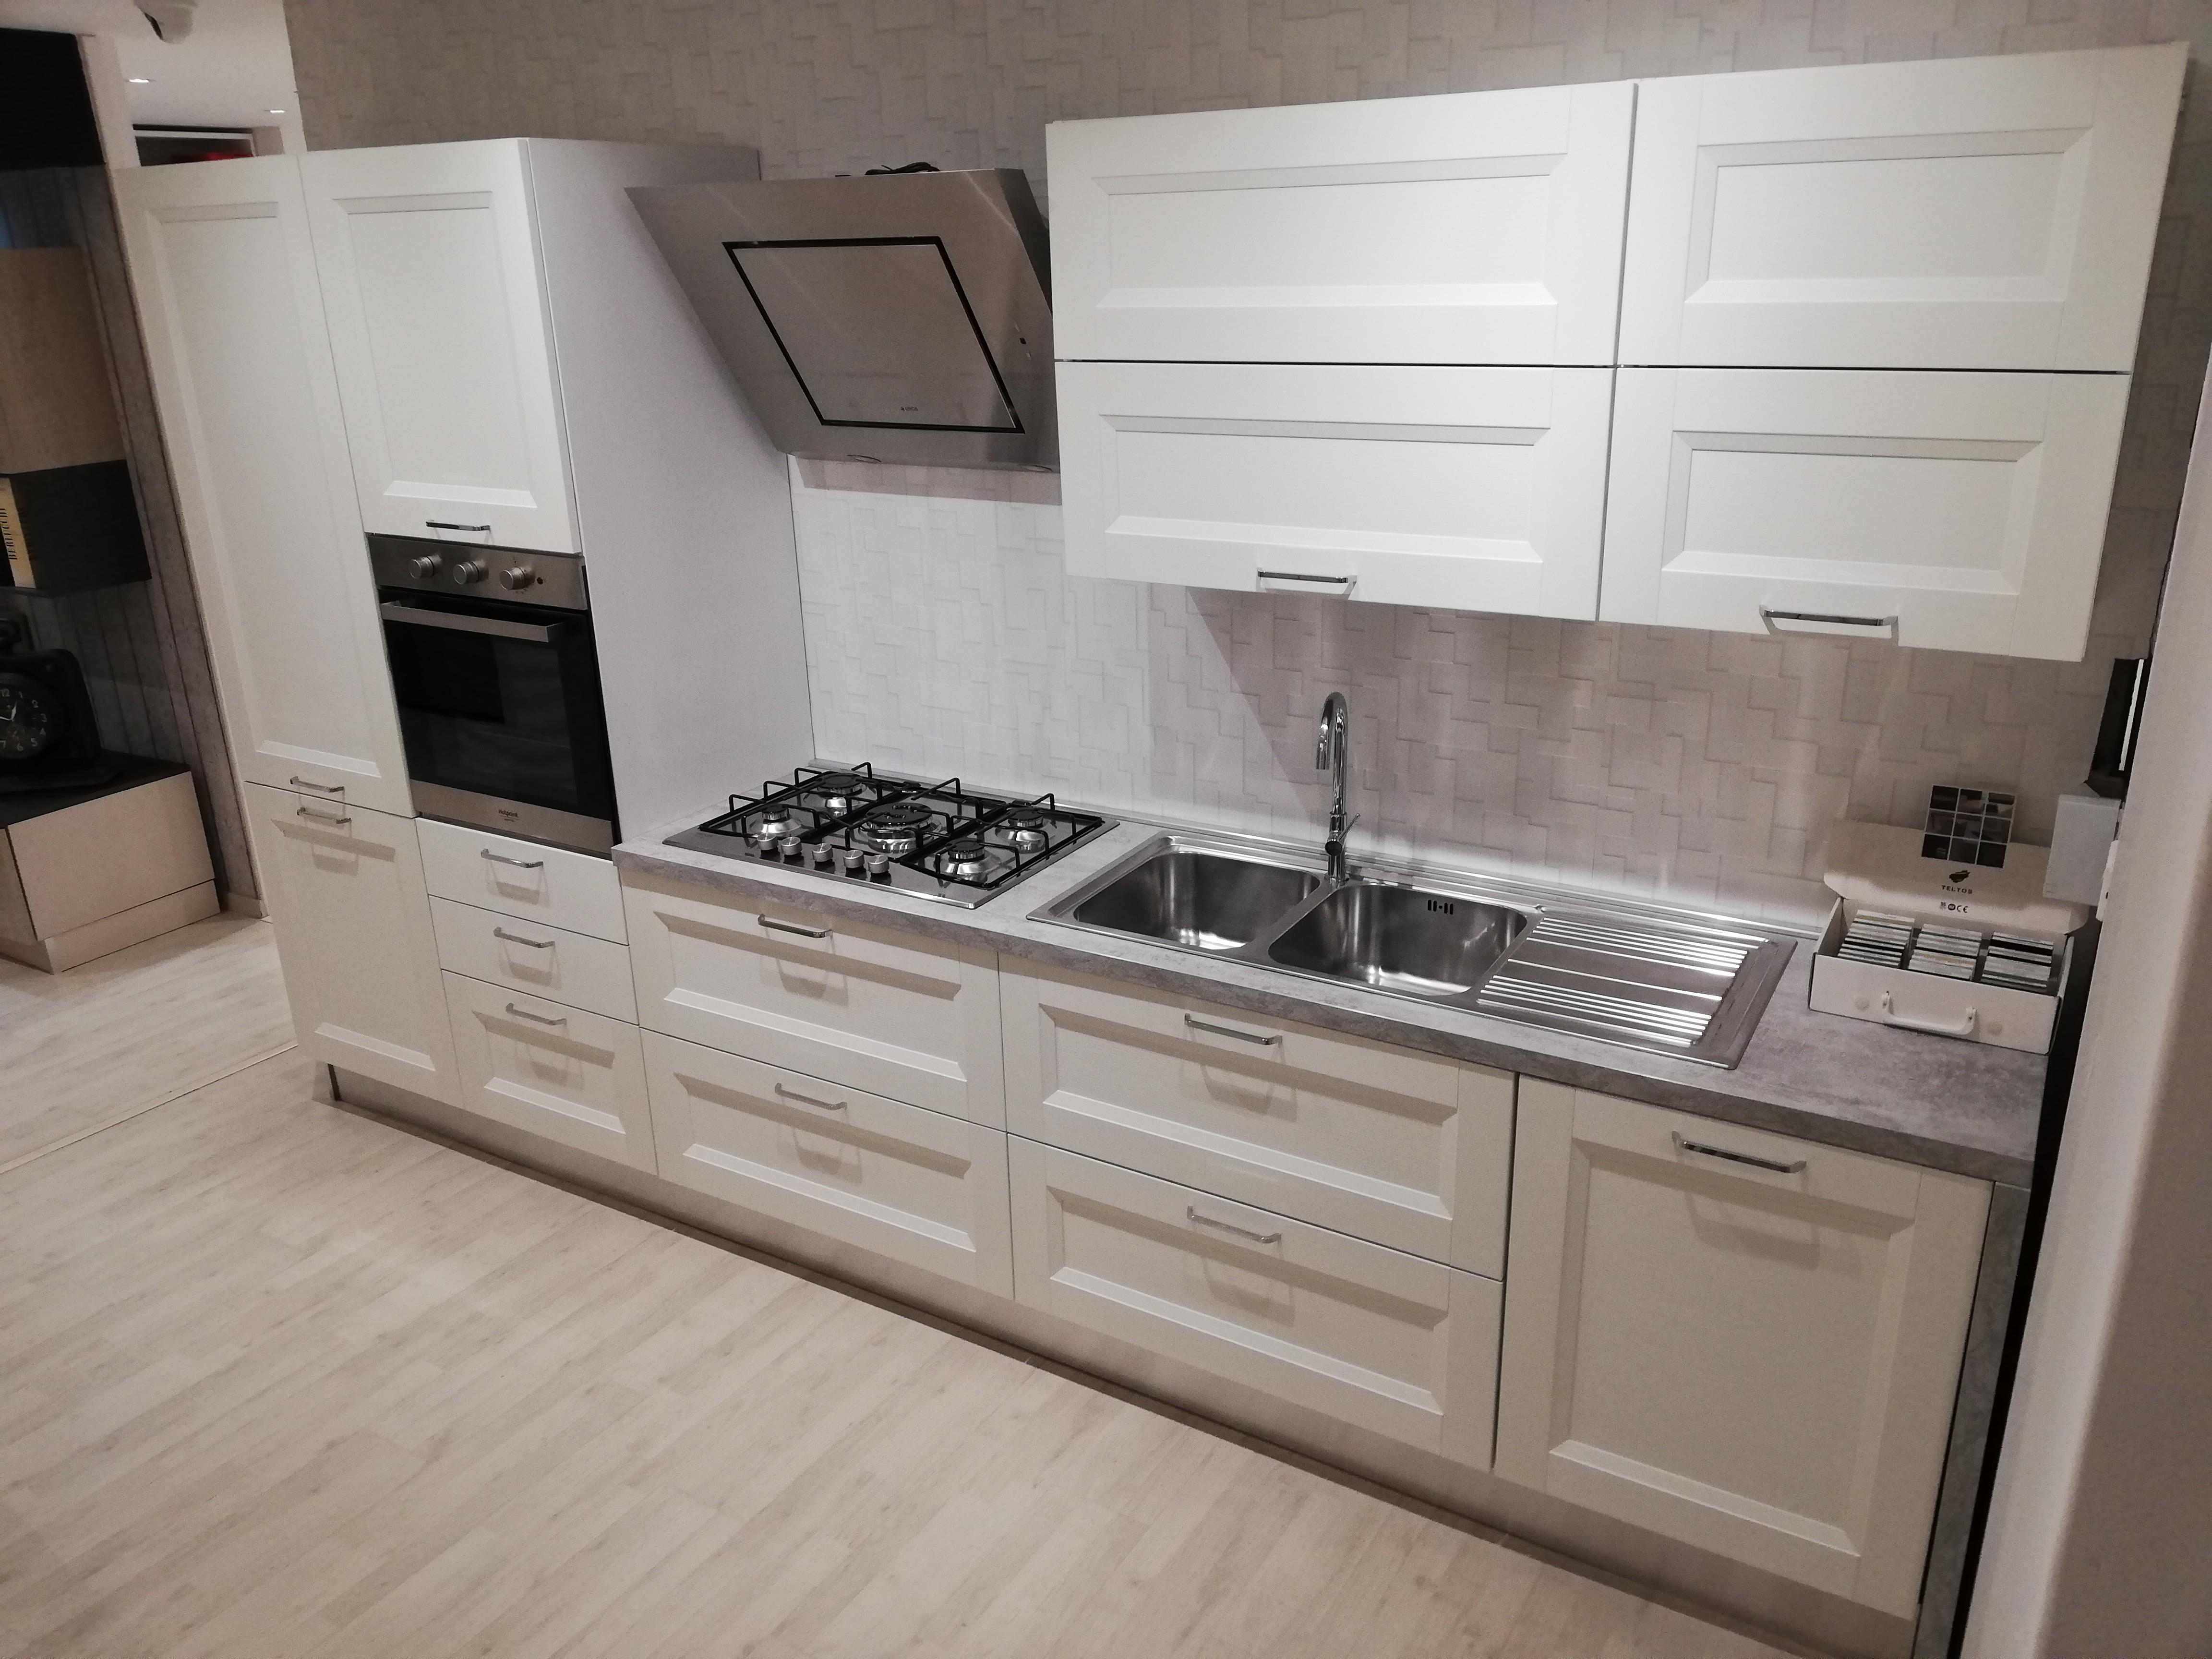 Cucina bianca ciao abitare arredamenti for Abitare arredamenti camerette